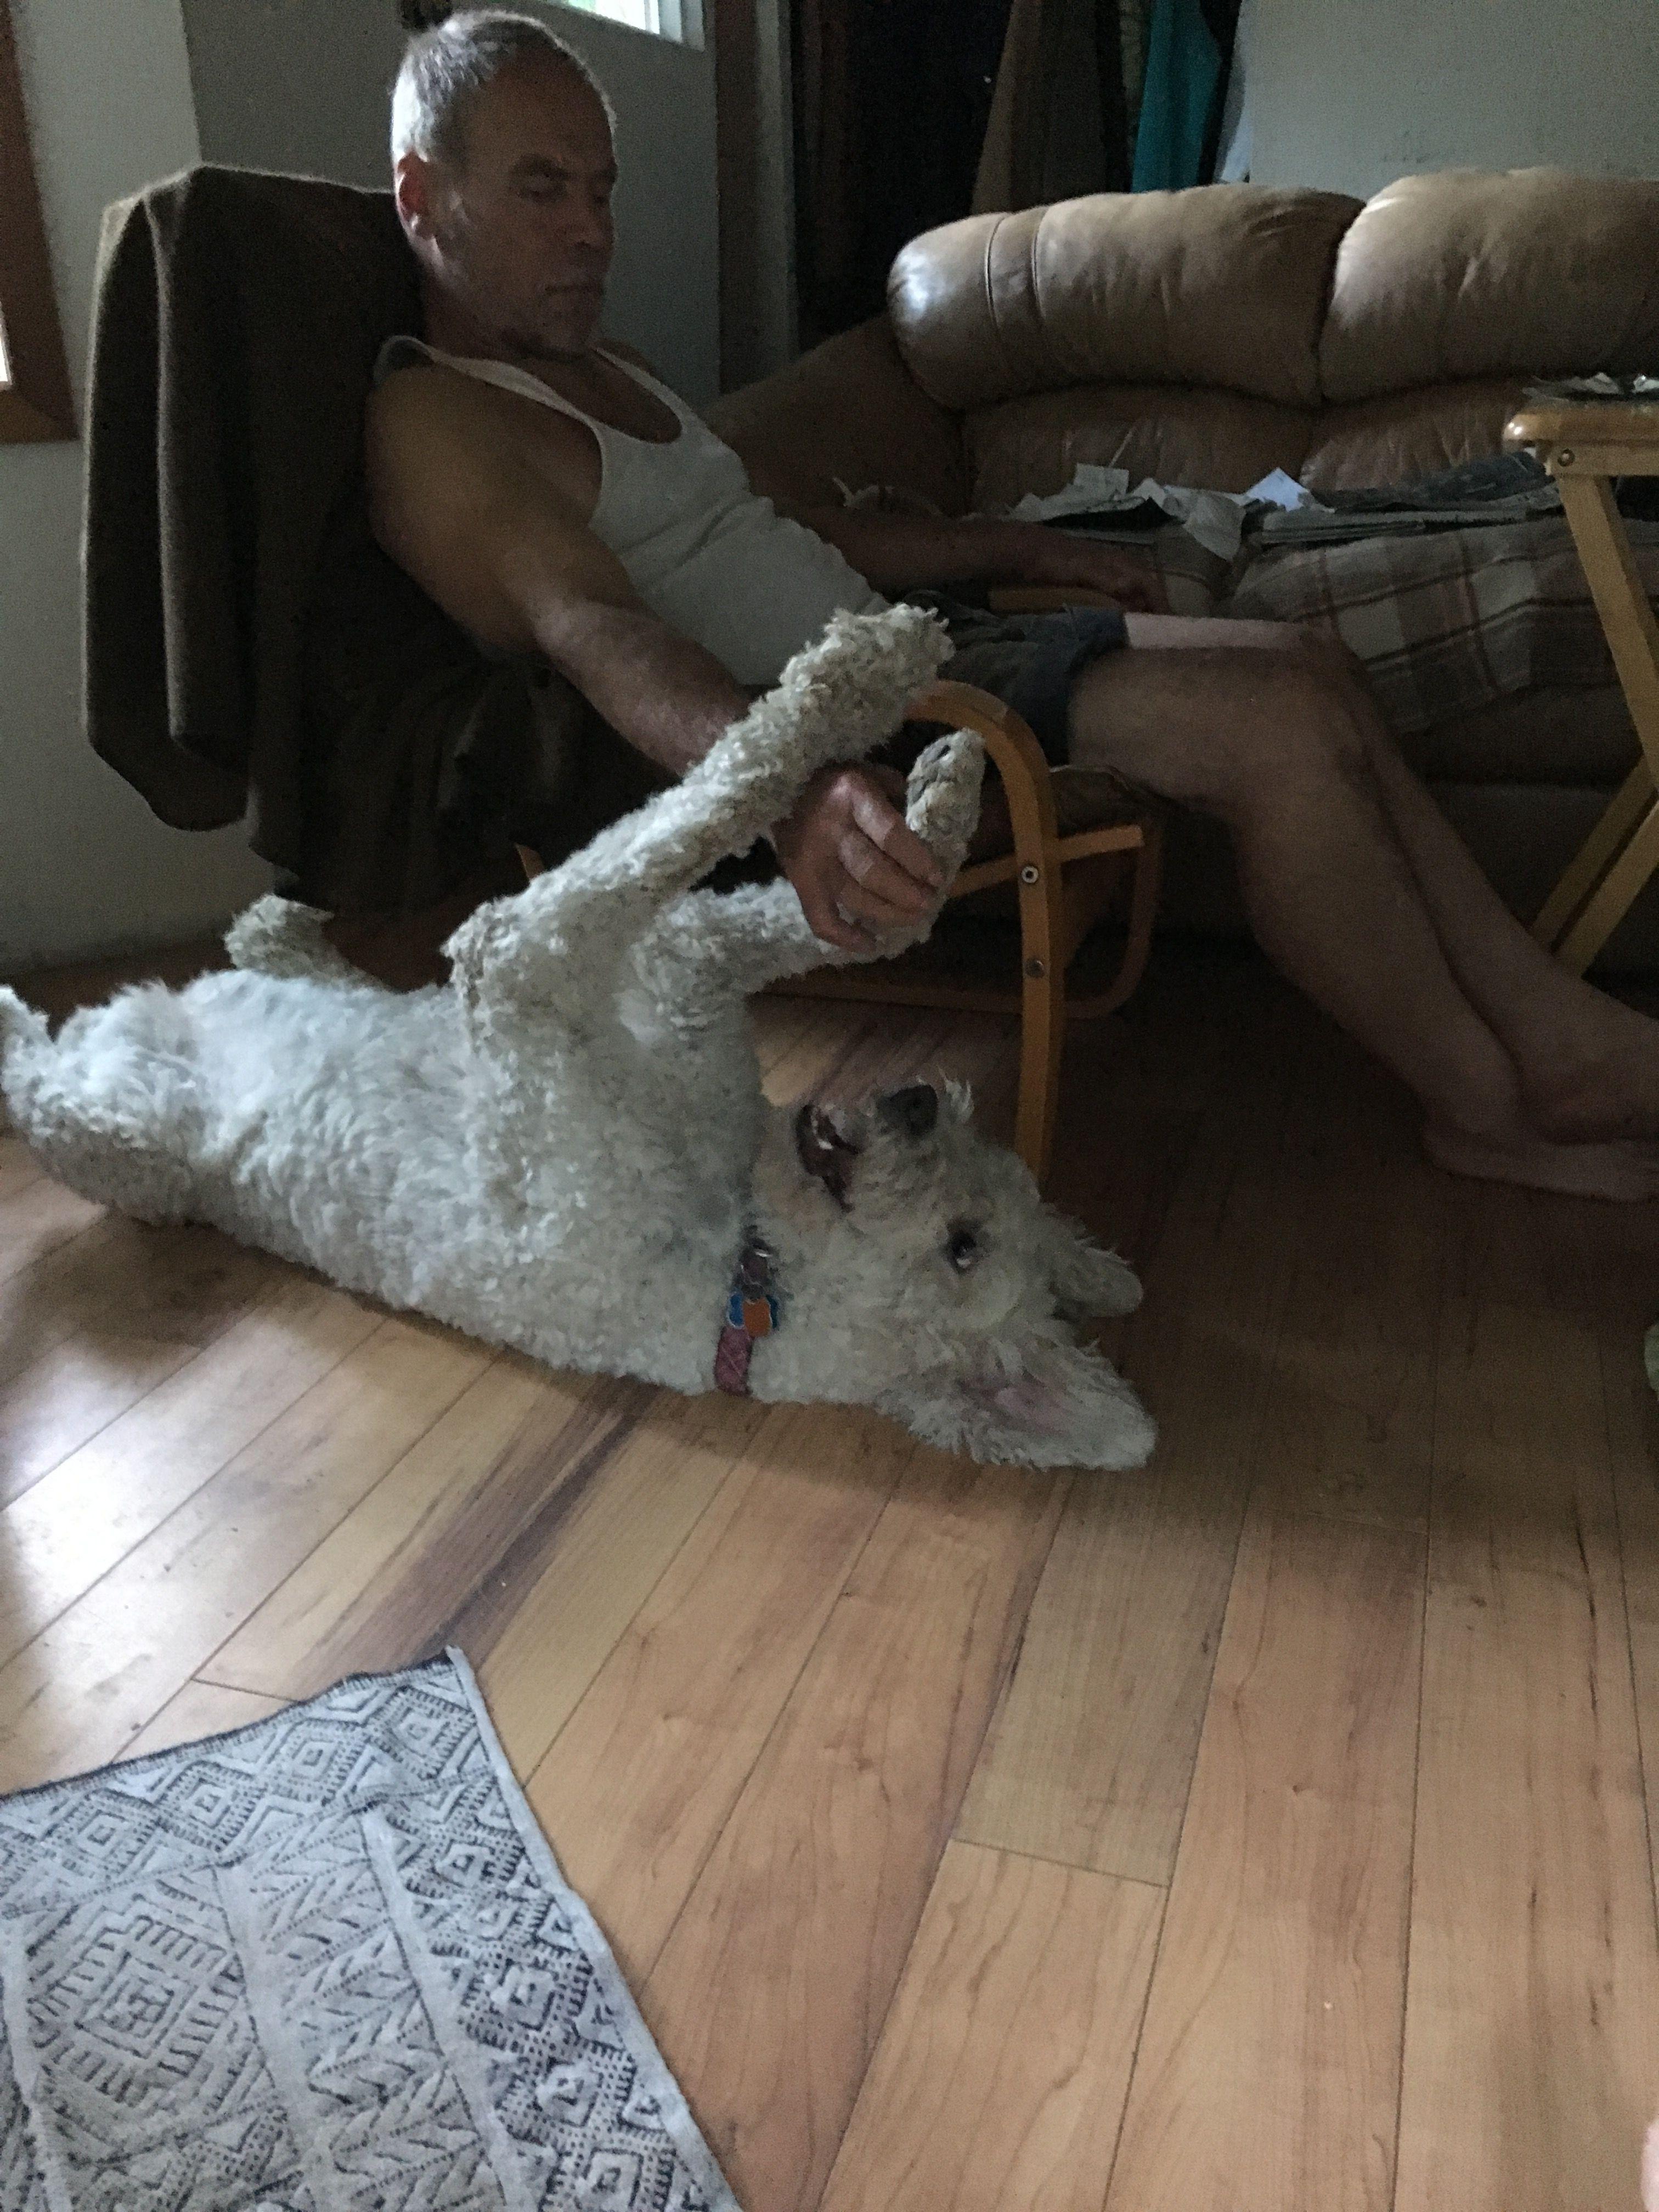 Pin By Shari Parsons On Komondor Komondor Dogs Victoria Bc Canada